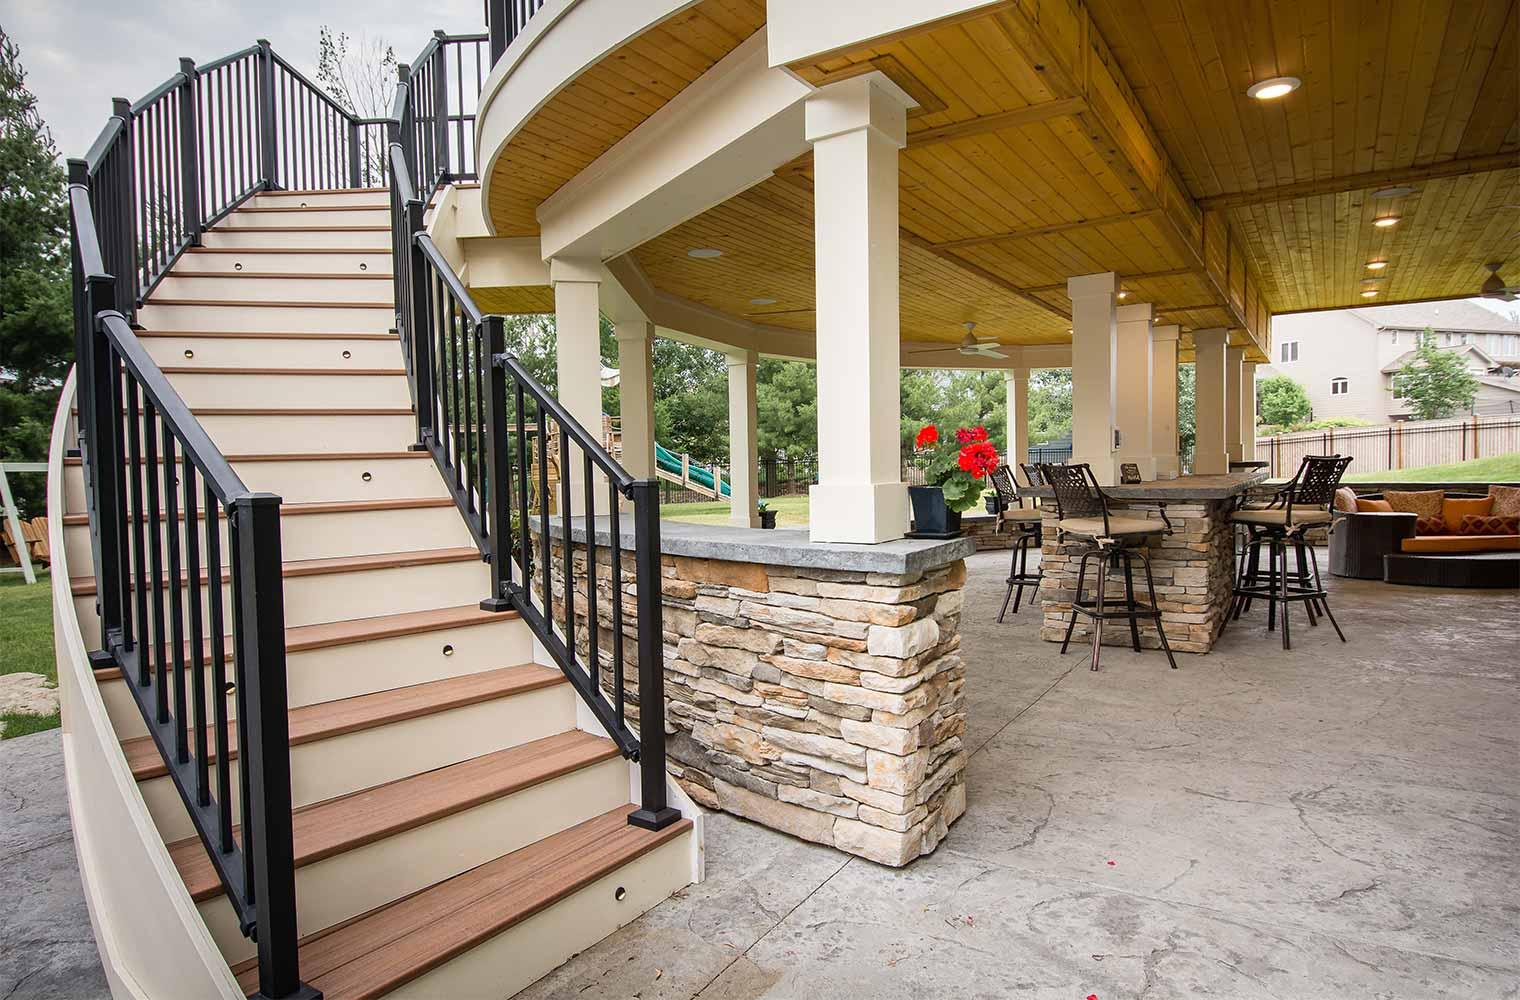 Backyard Renovation: Resort-like with Multiple Spaces, a ... on Backyard Patio Steps id=63319